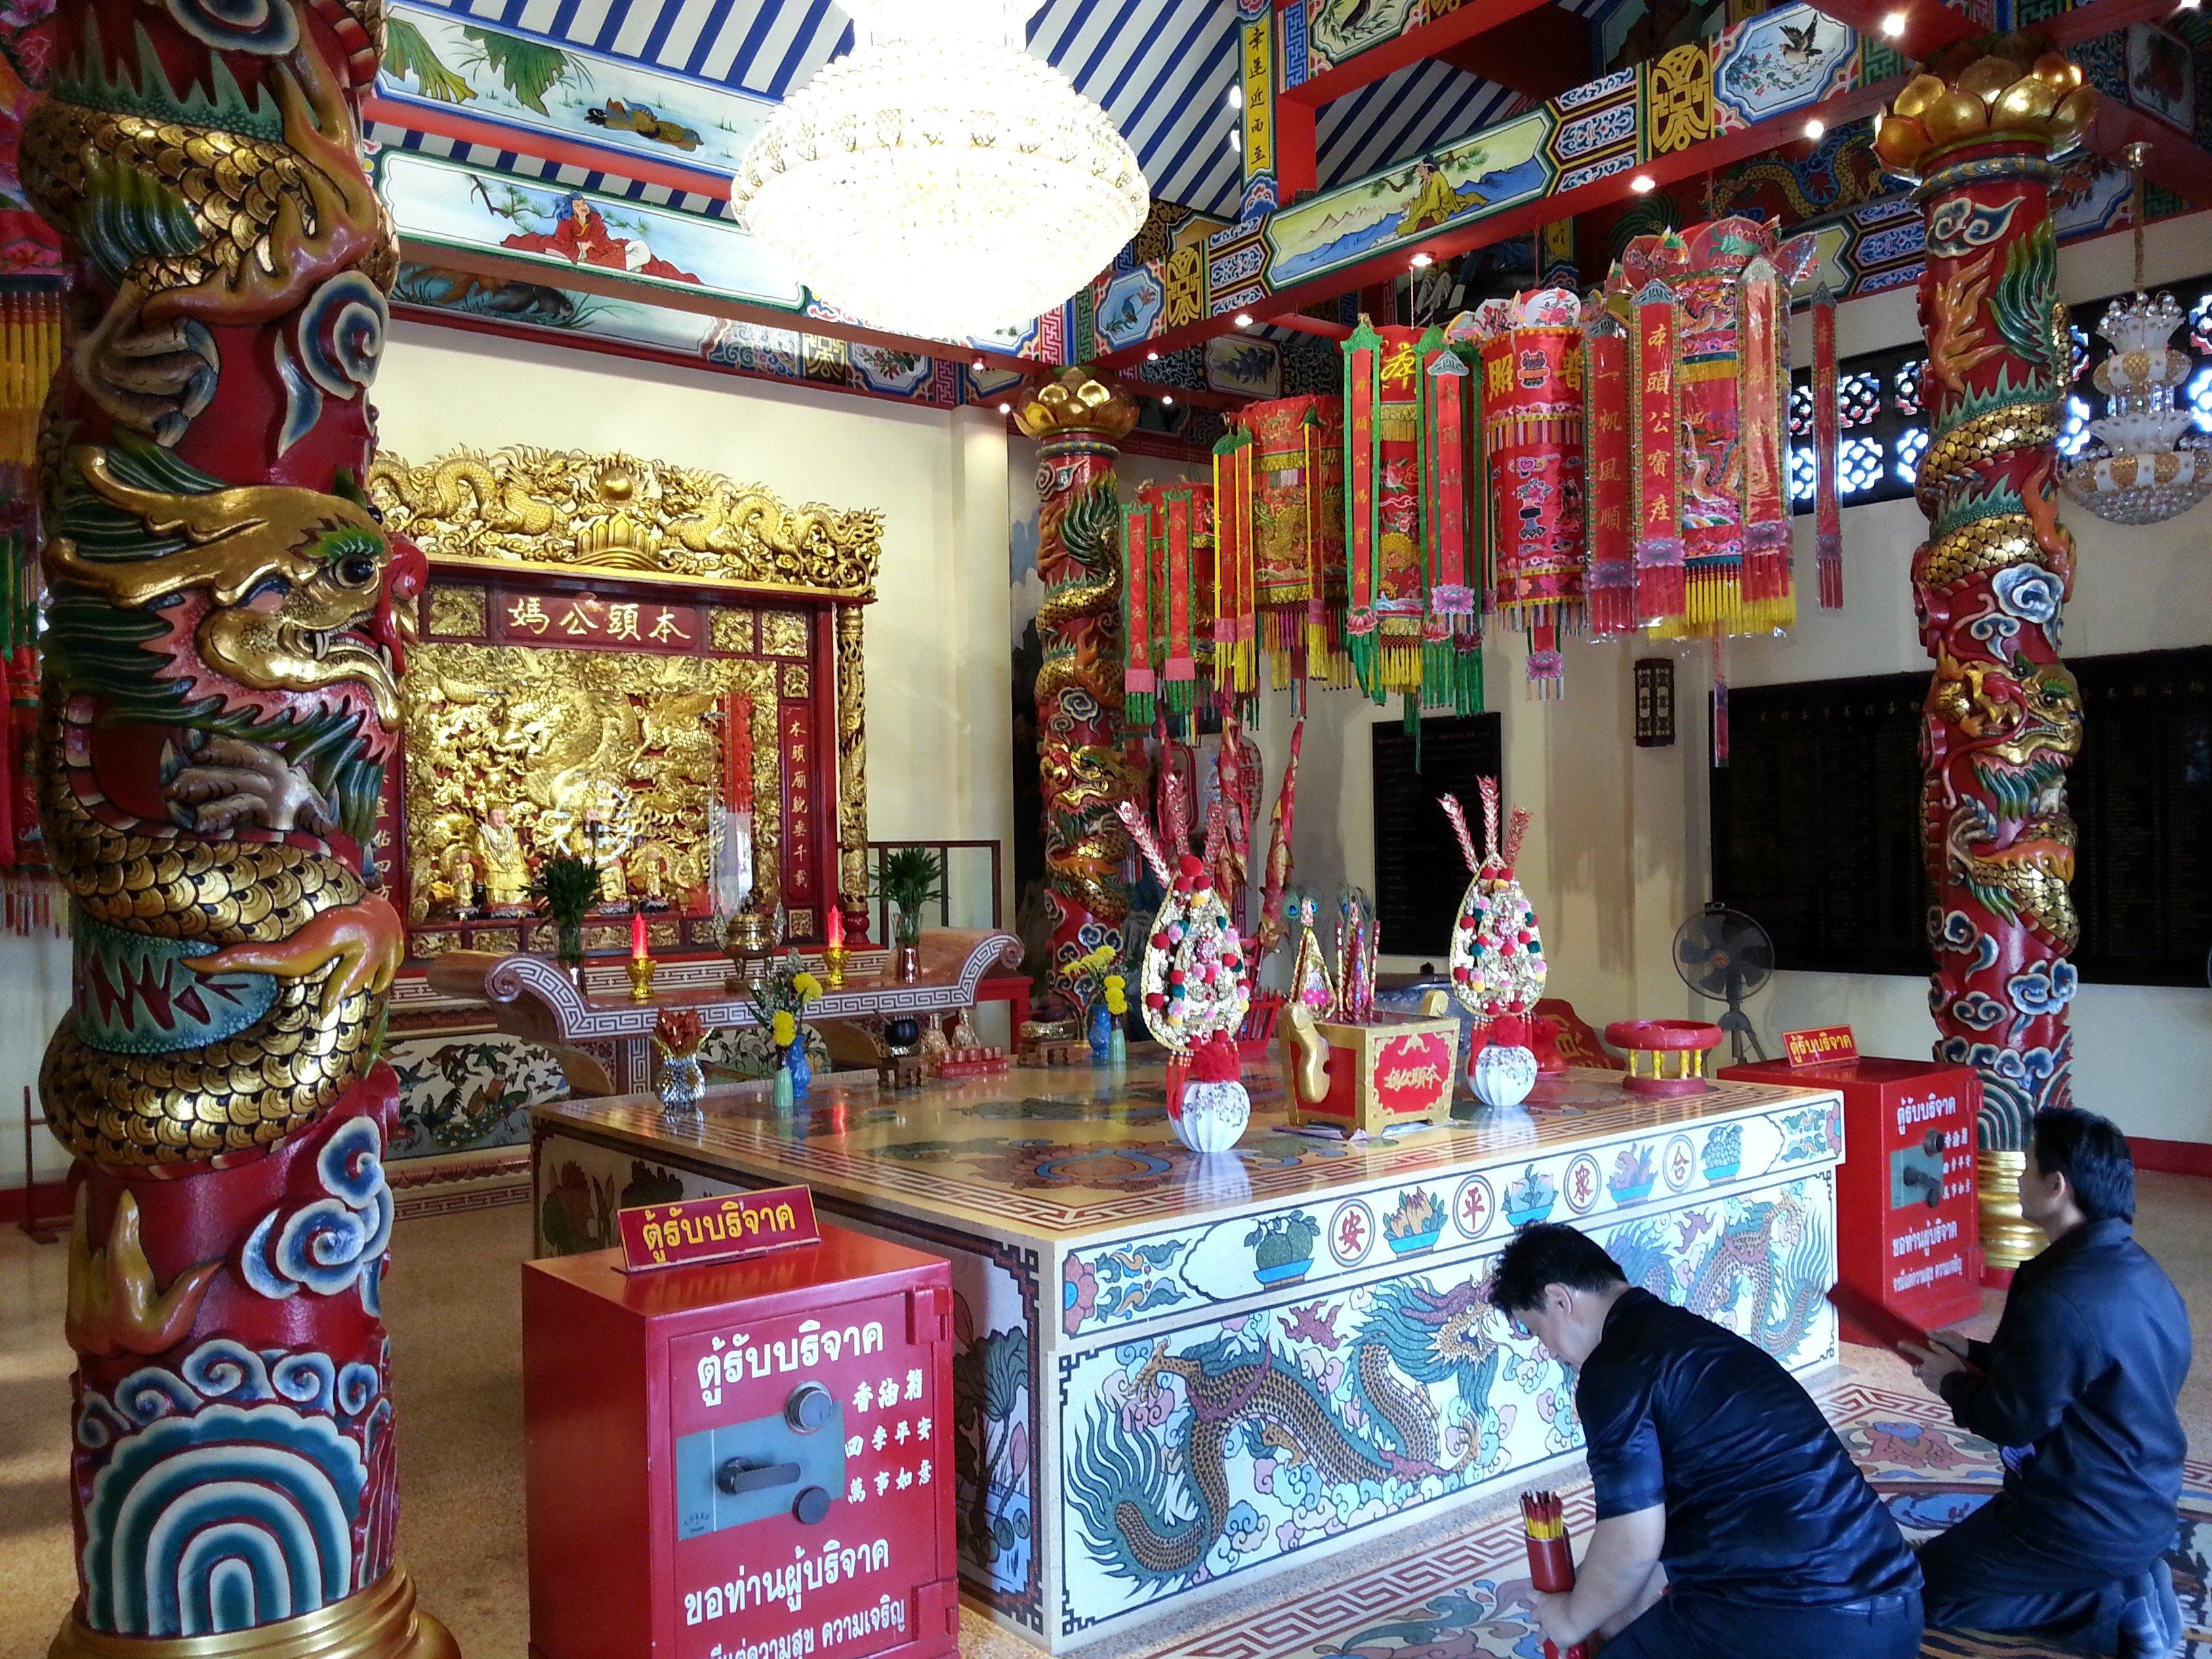 Altar at the Chao Pu-Ya Shrine